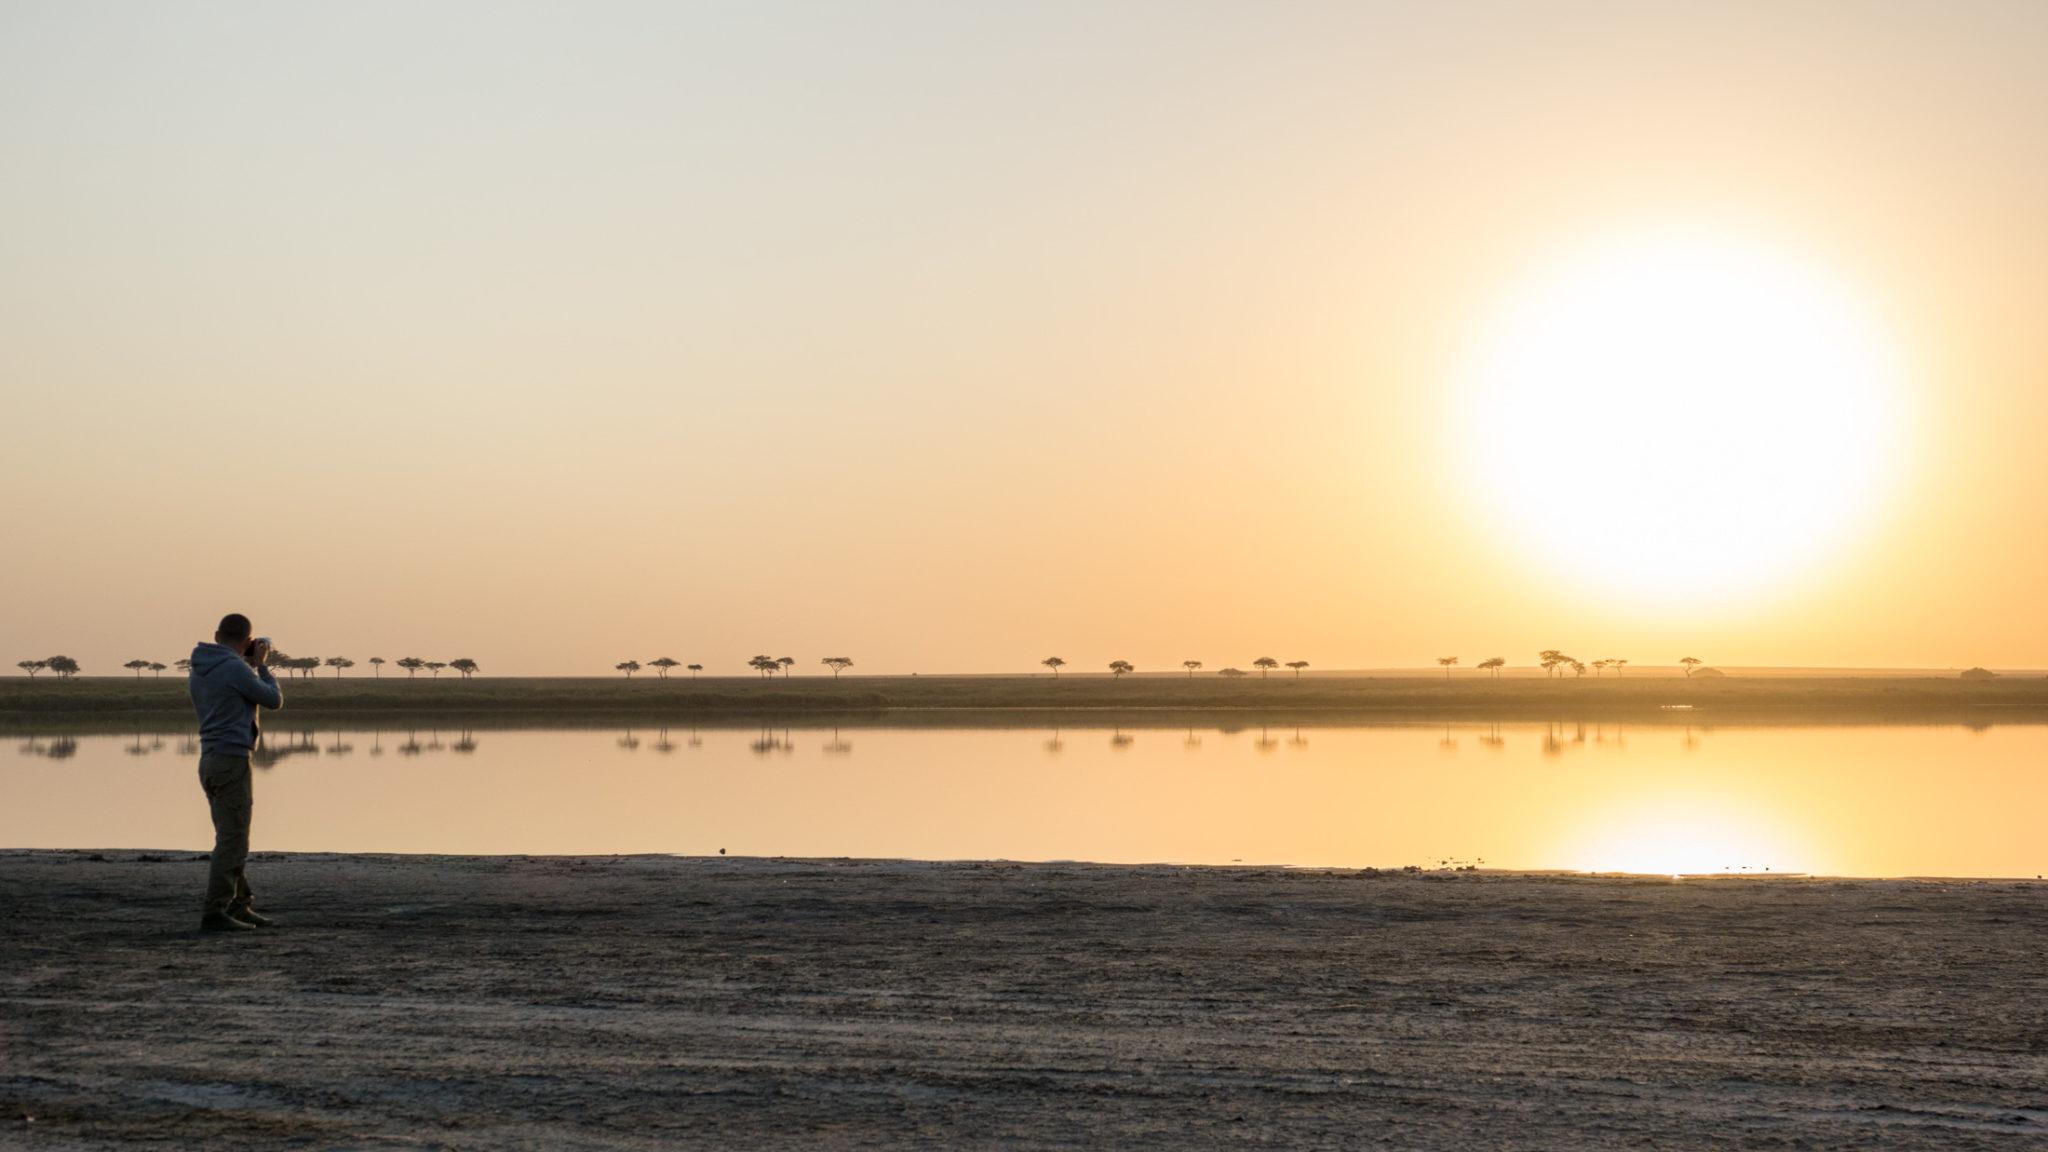 Sonnenaufgang am See in der Serengeti, Tansania